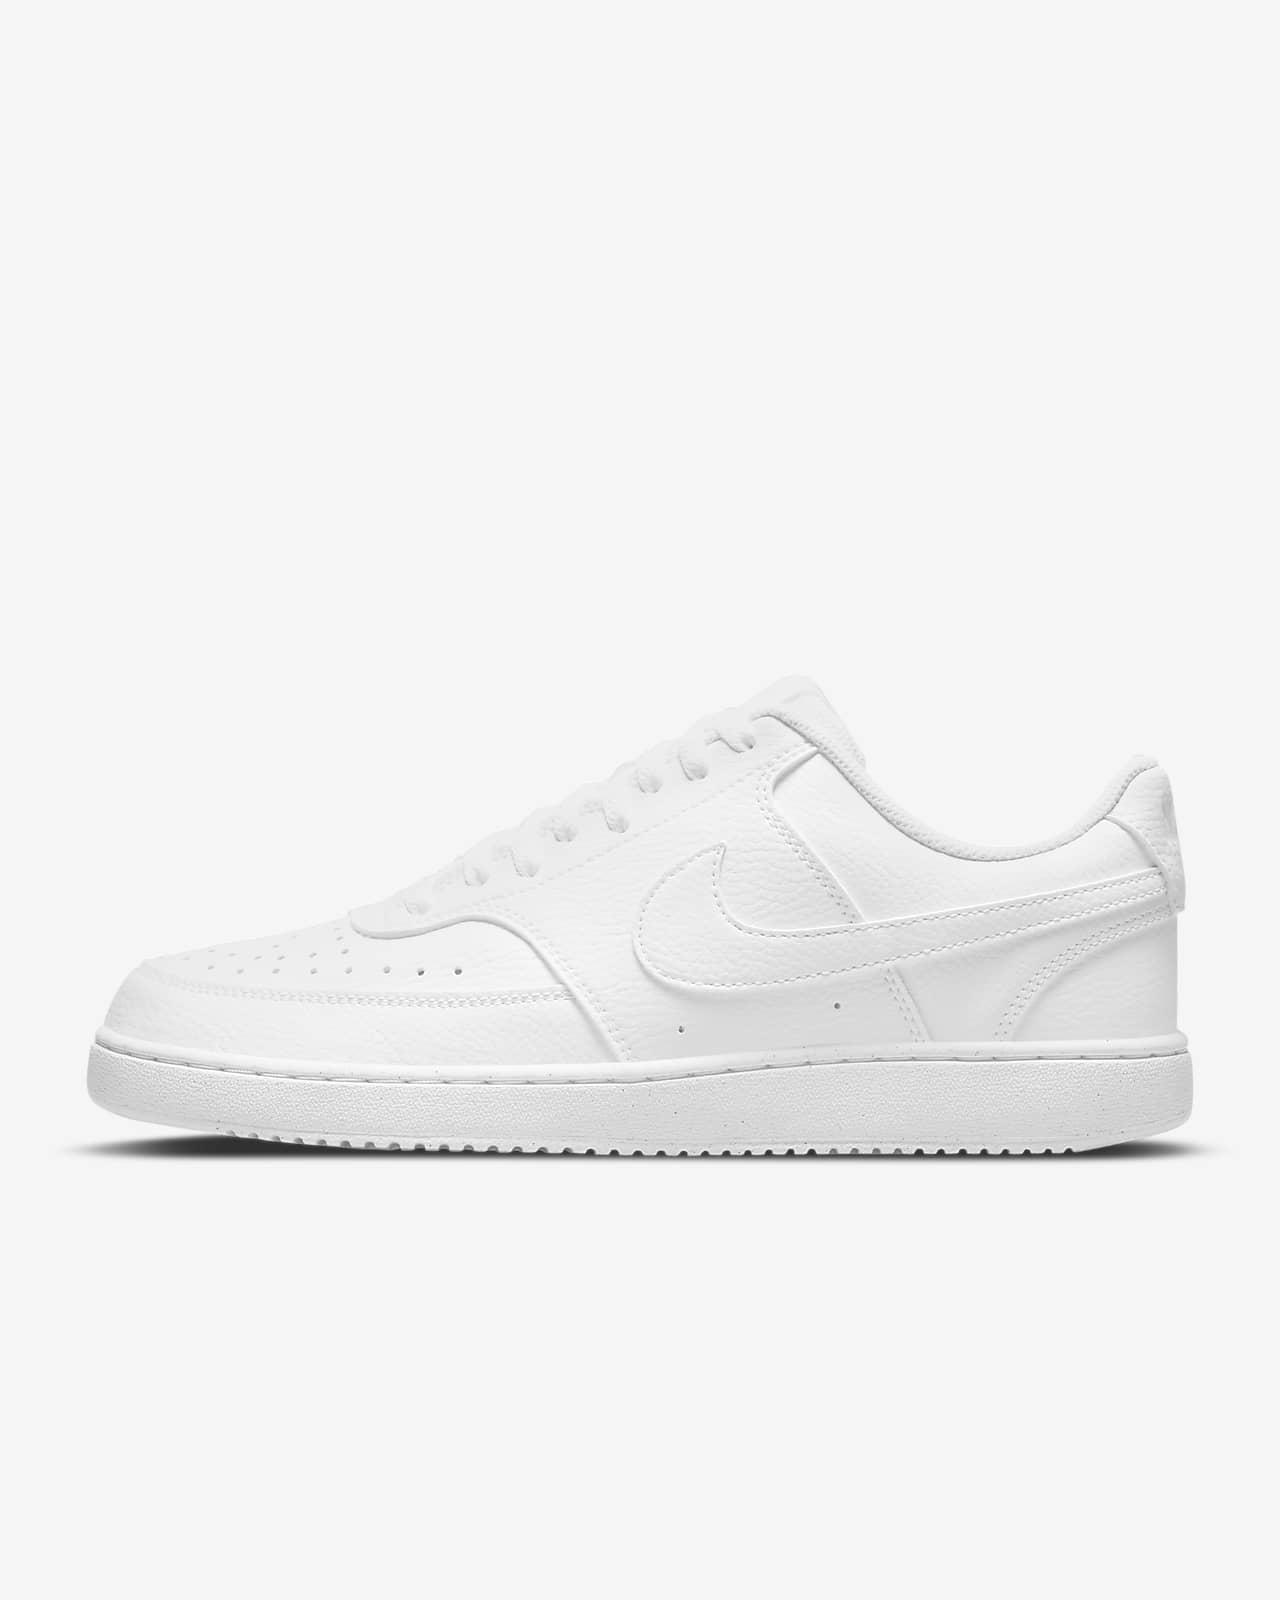 Nike Court Vision Low Next Nature Men's Shoes